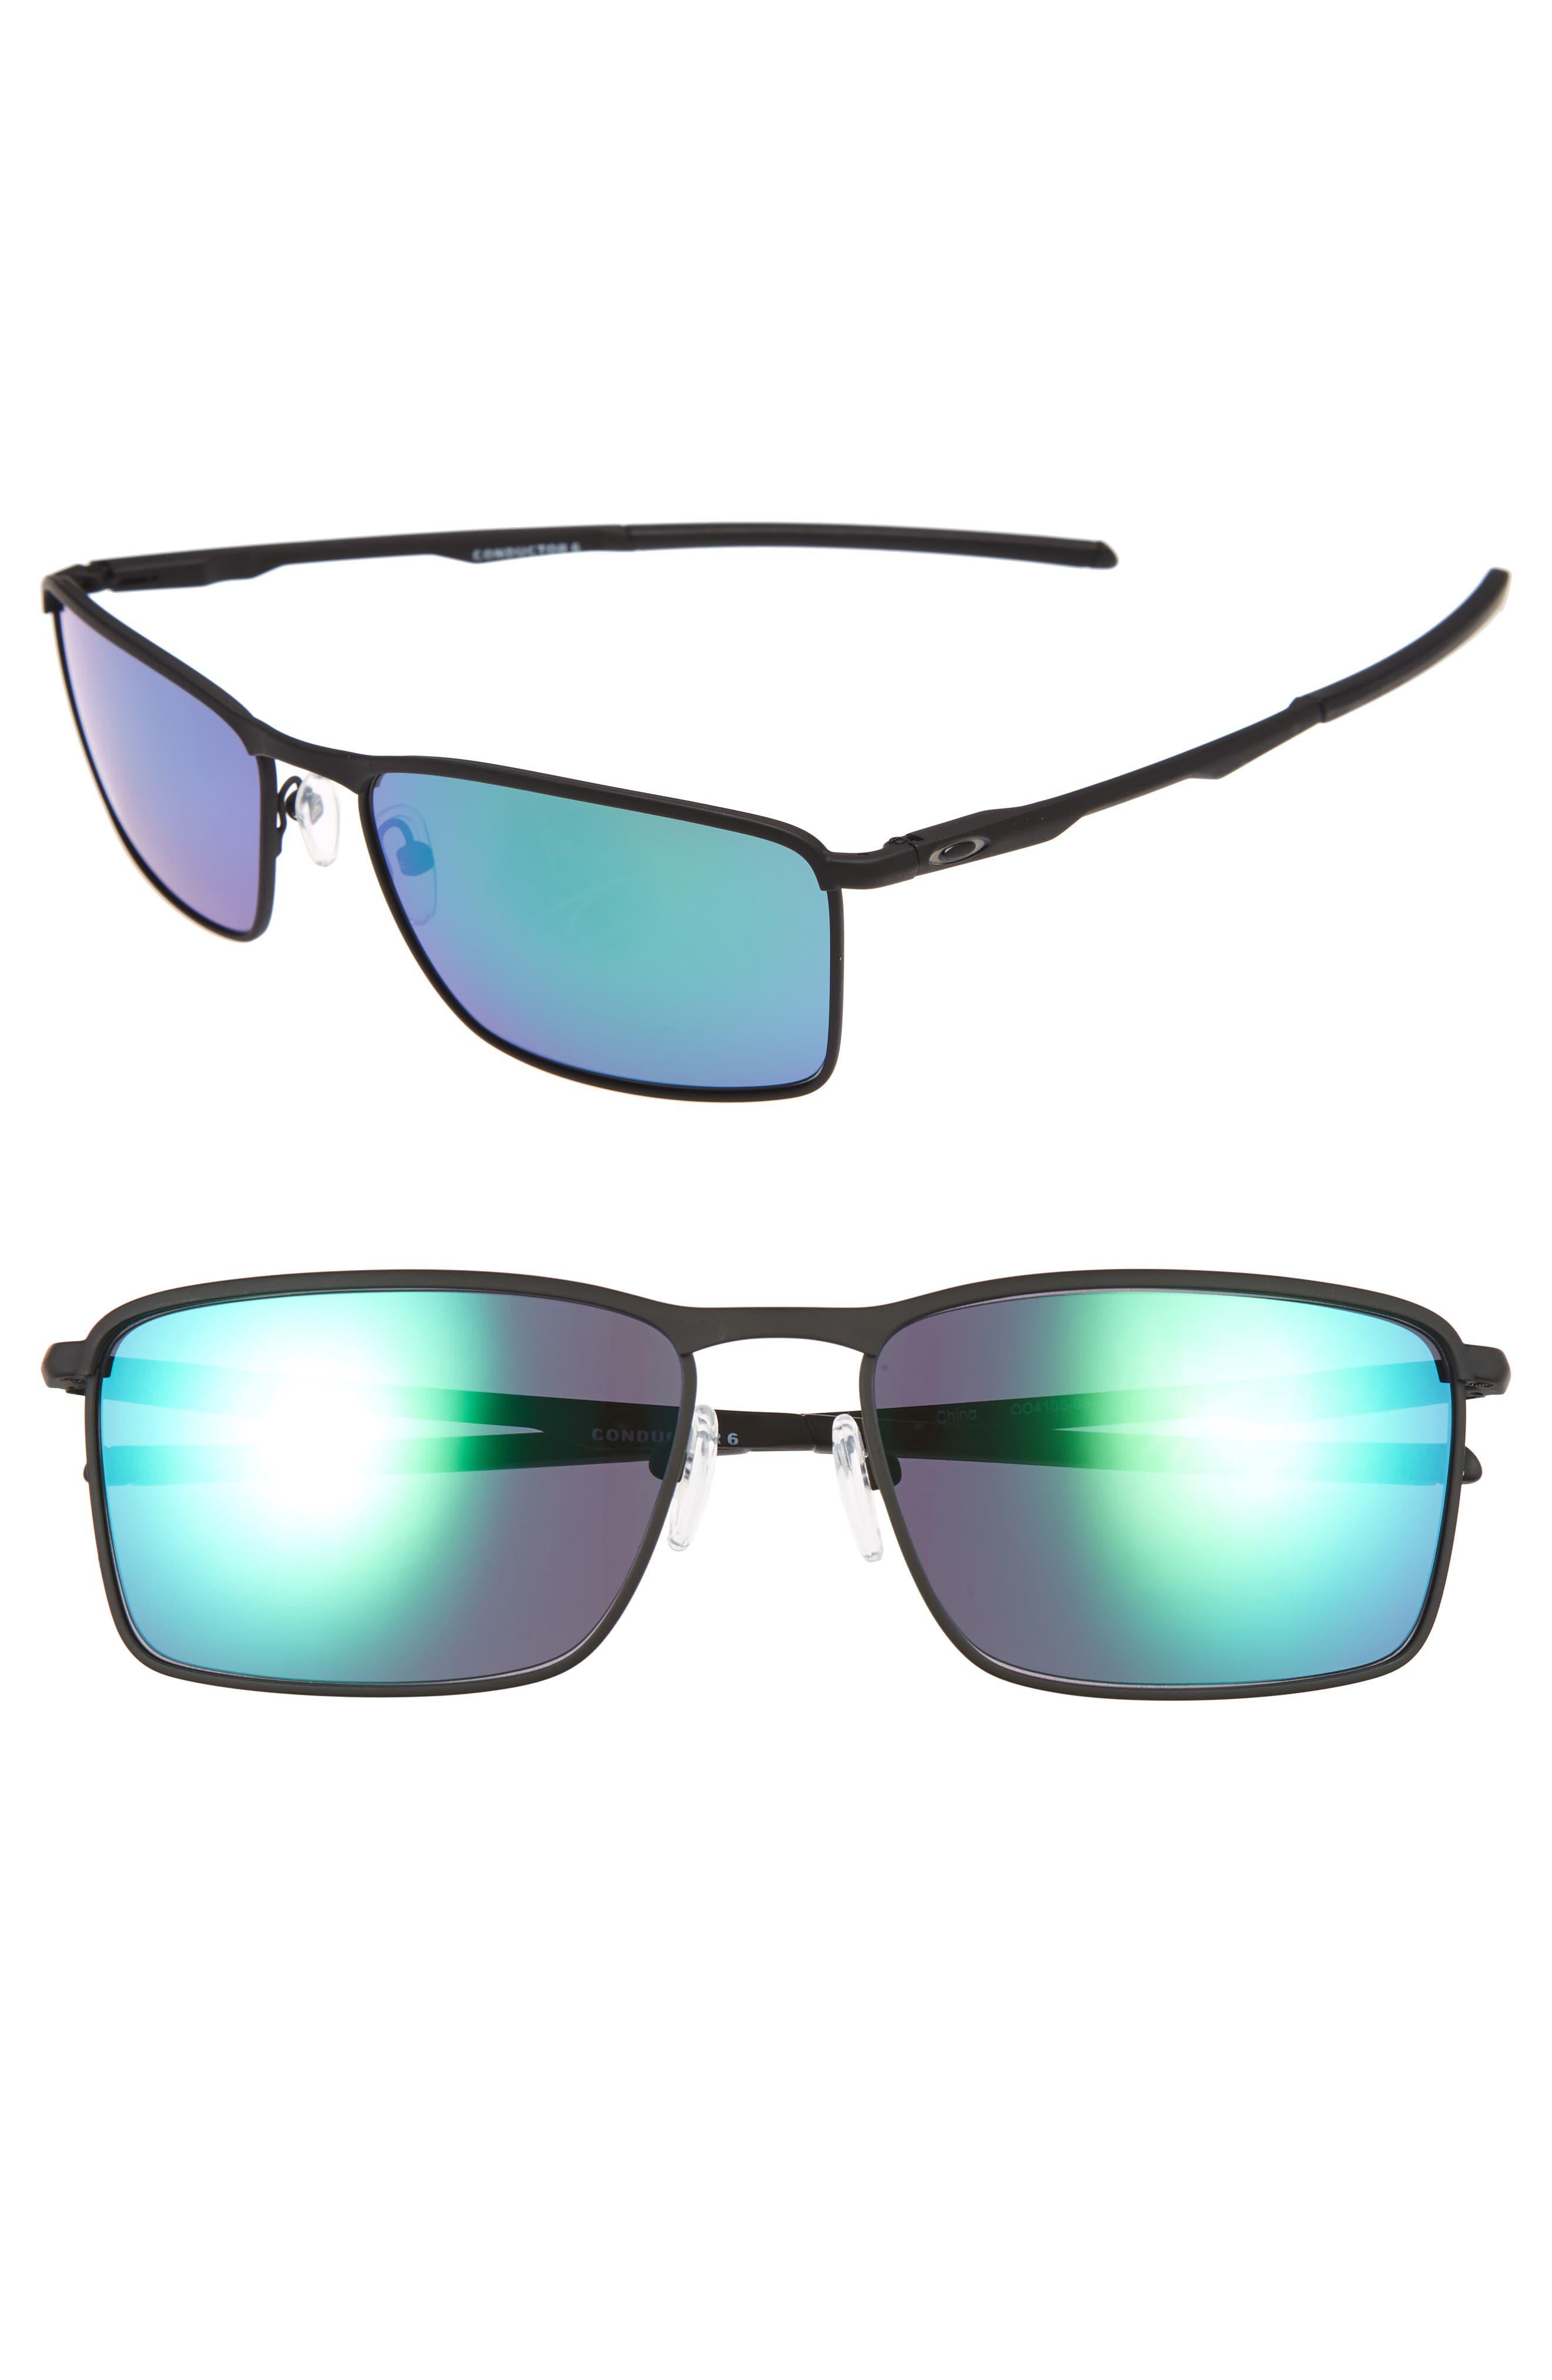 Main Image - Oakley Conductor 6 58mm Polarized Sunglasses